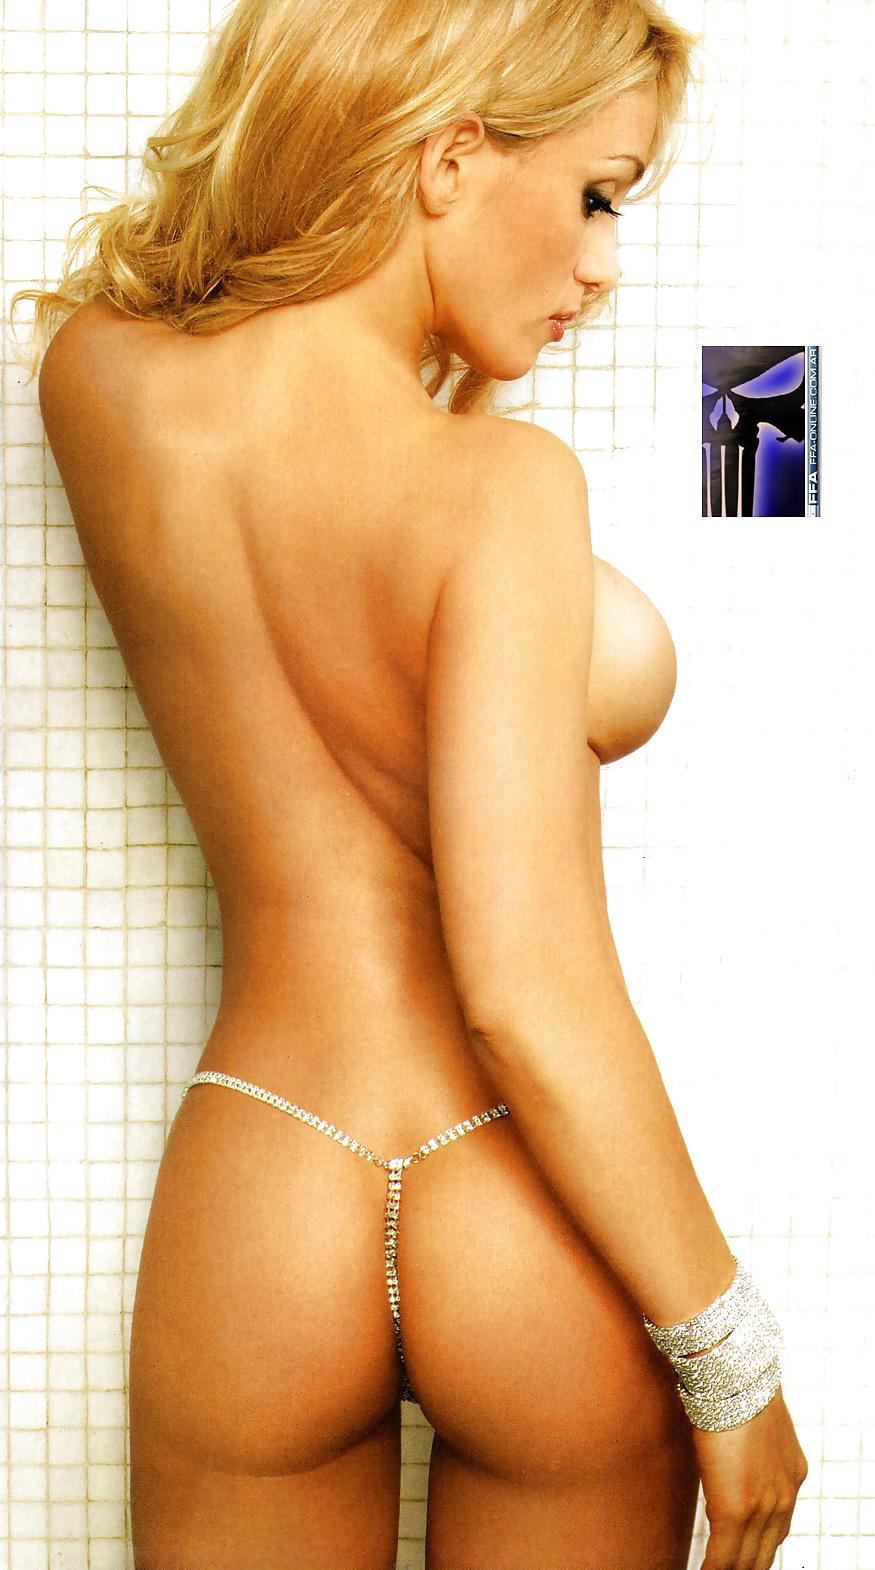 Maria eugenia rito naked in the tub